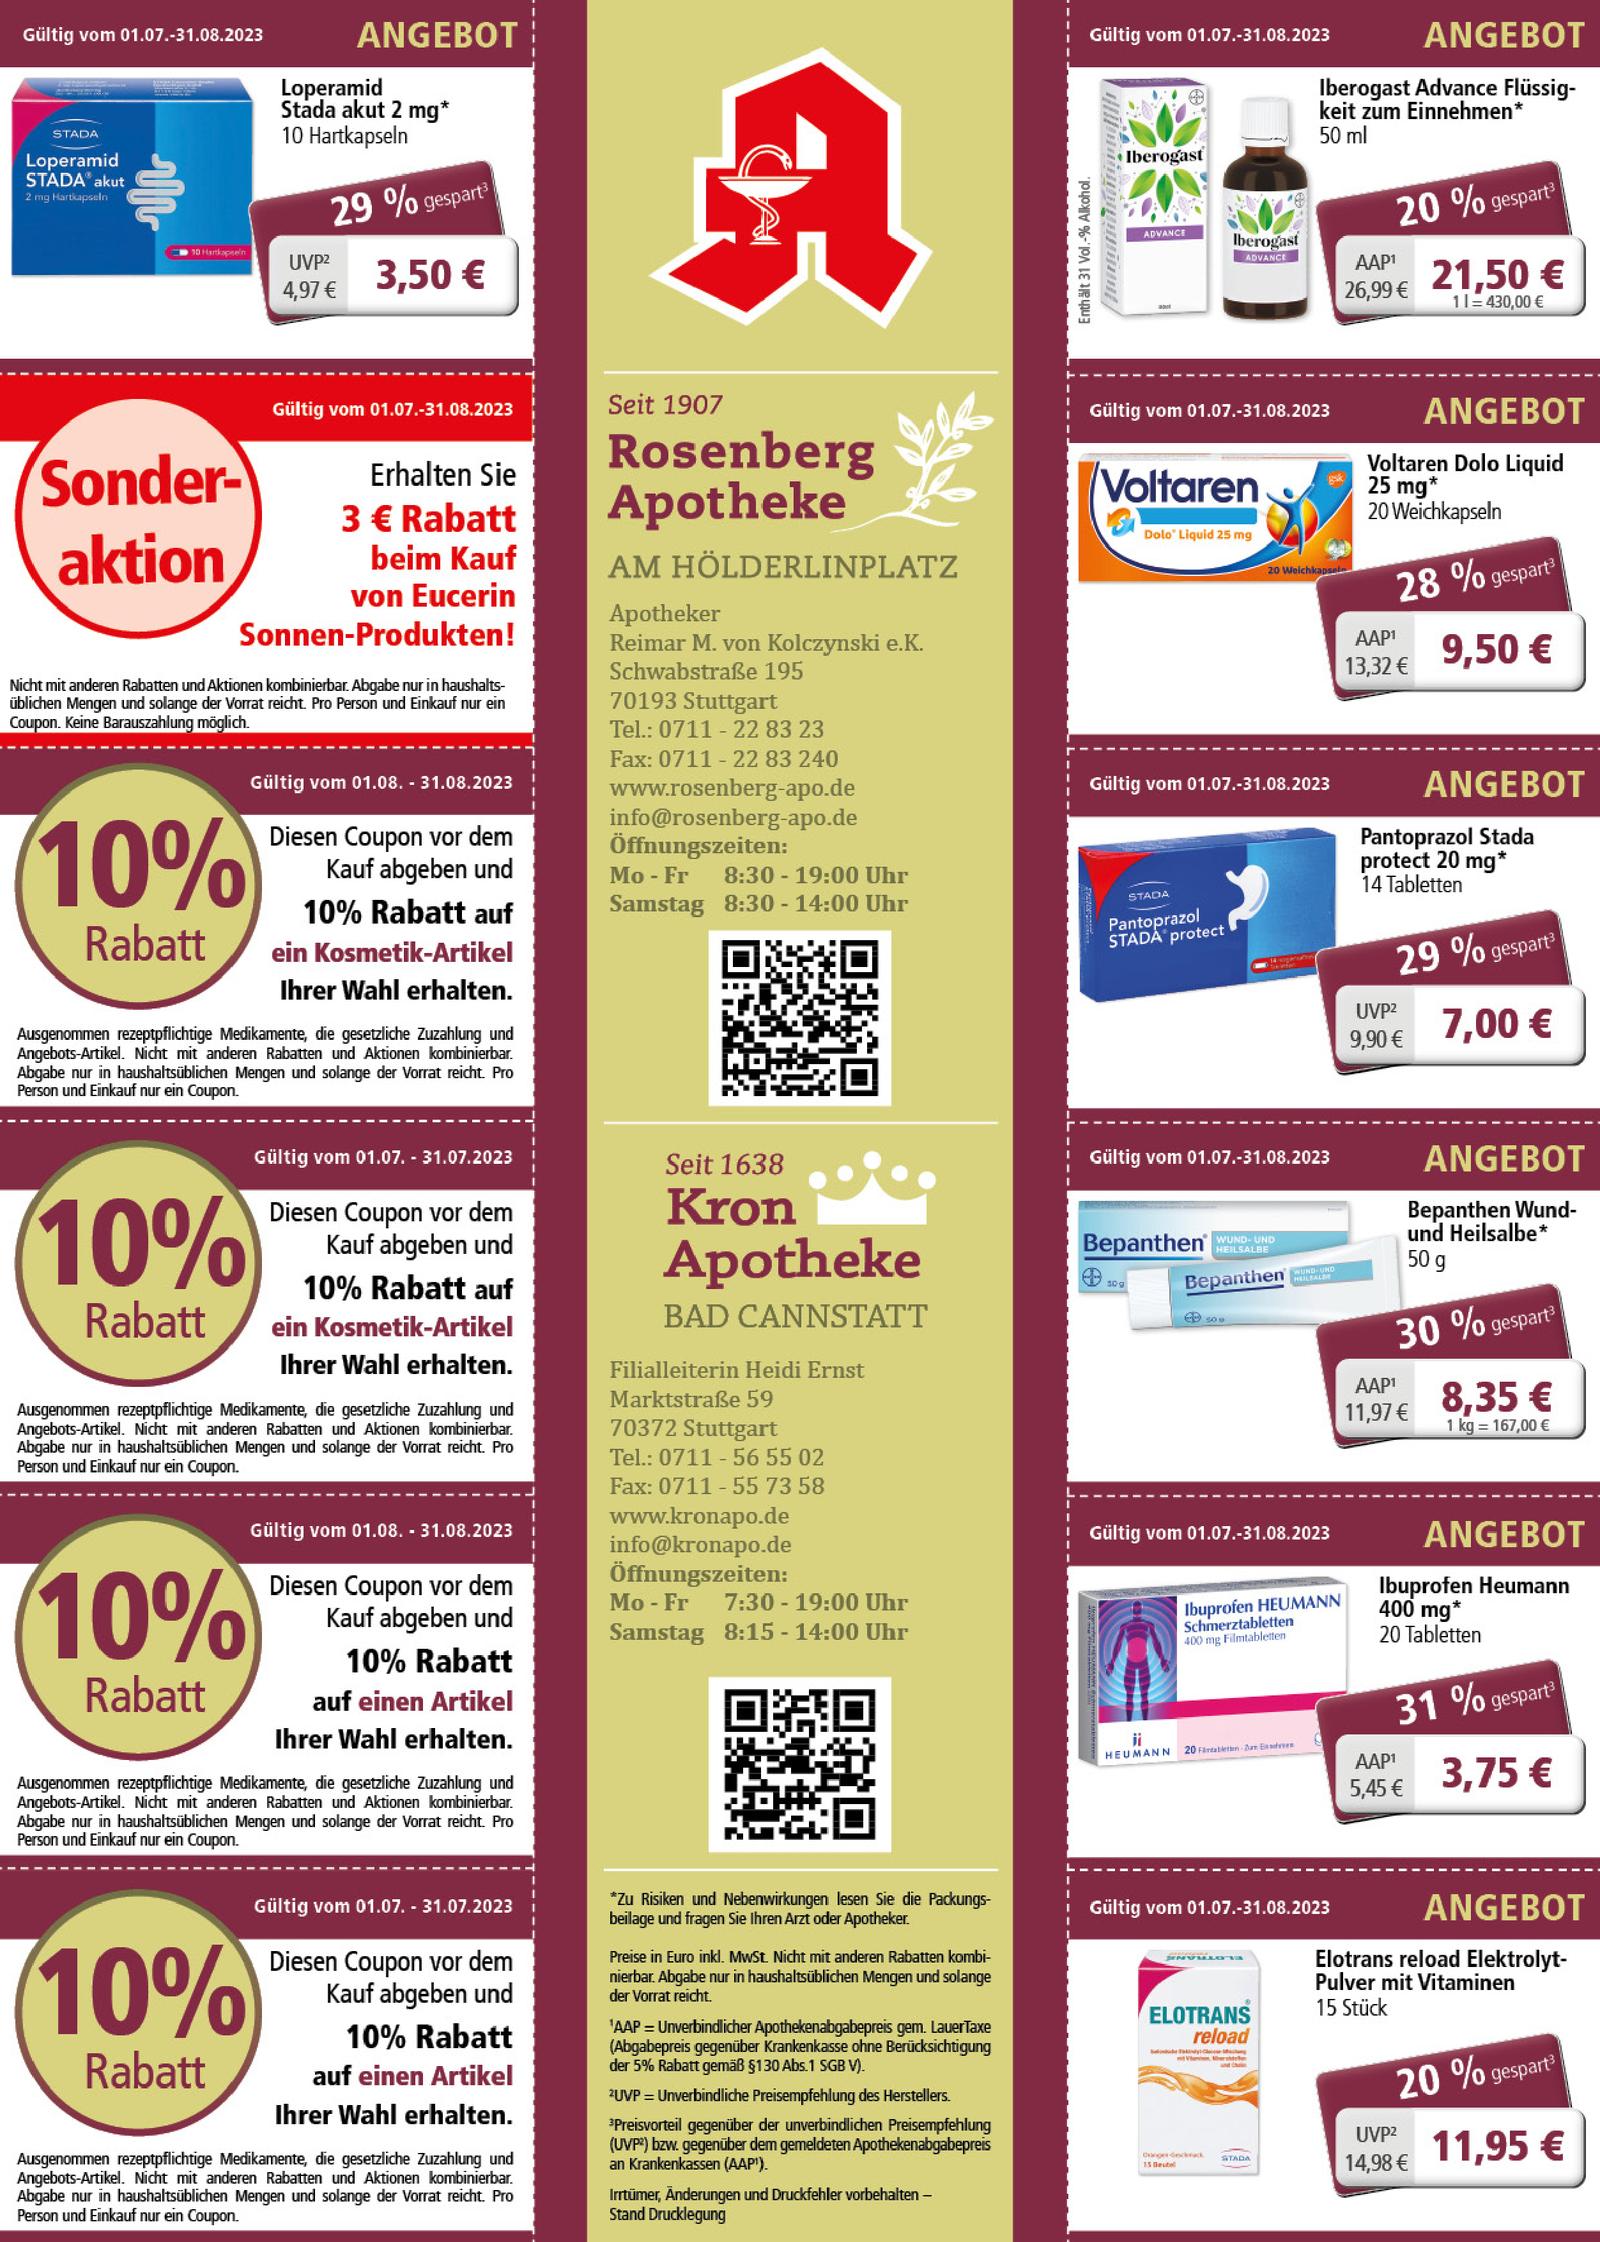 https://mein-uploads.apocdn.net/19199/leaflets/19199_flyer-Seite1.png